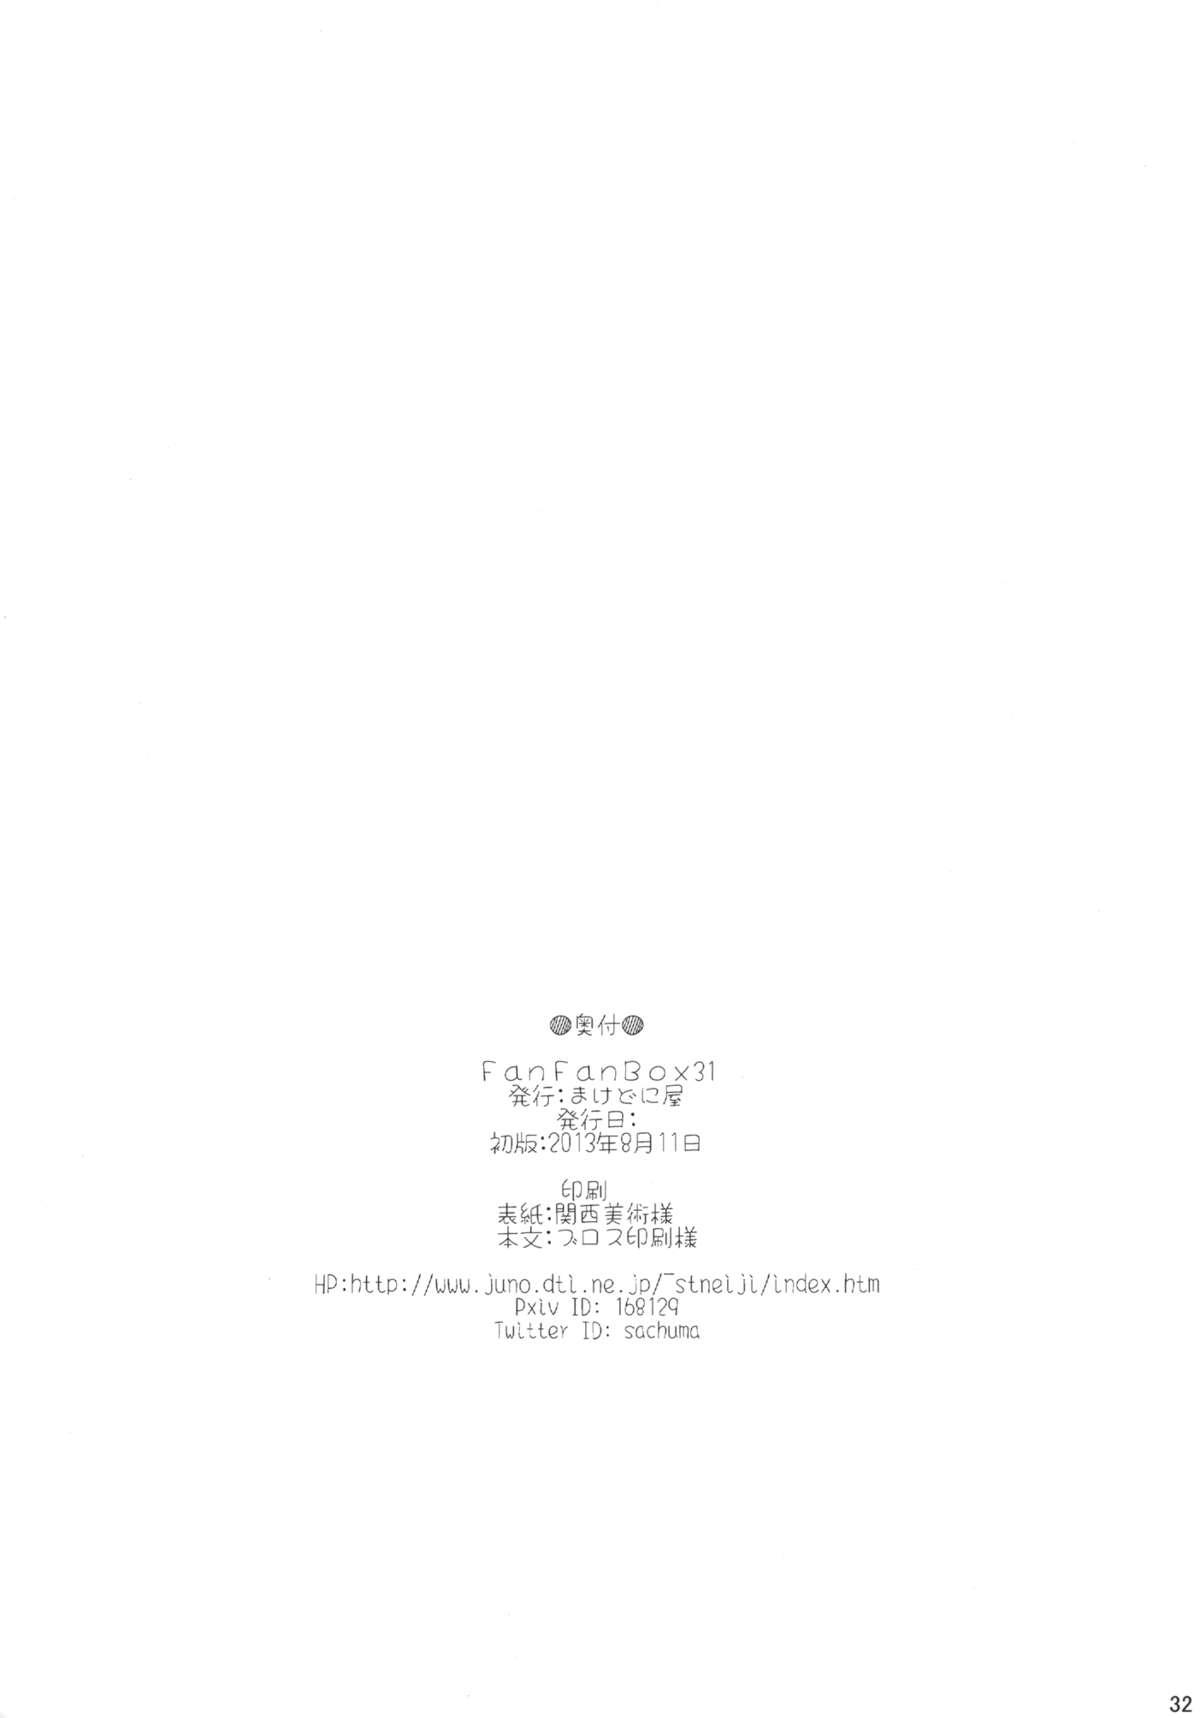 FanFanBox 31 33